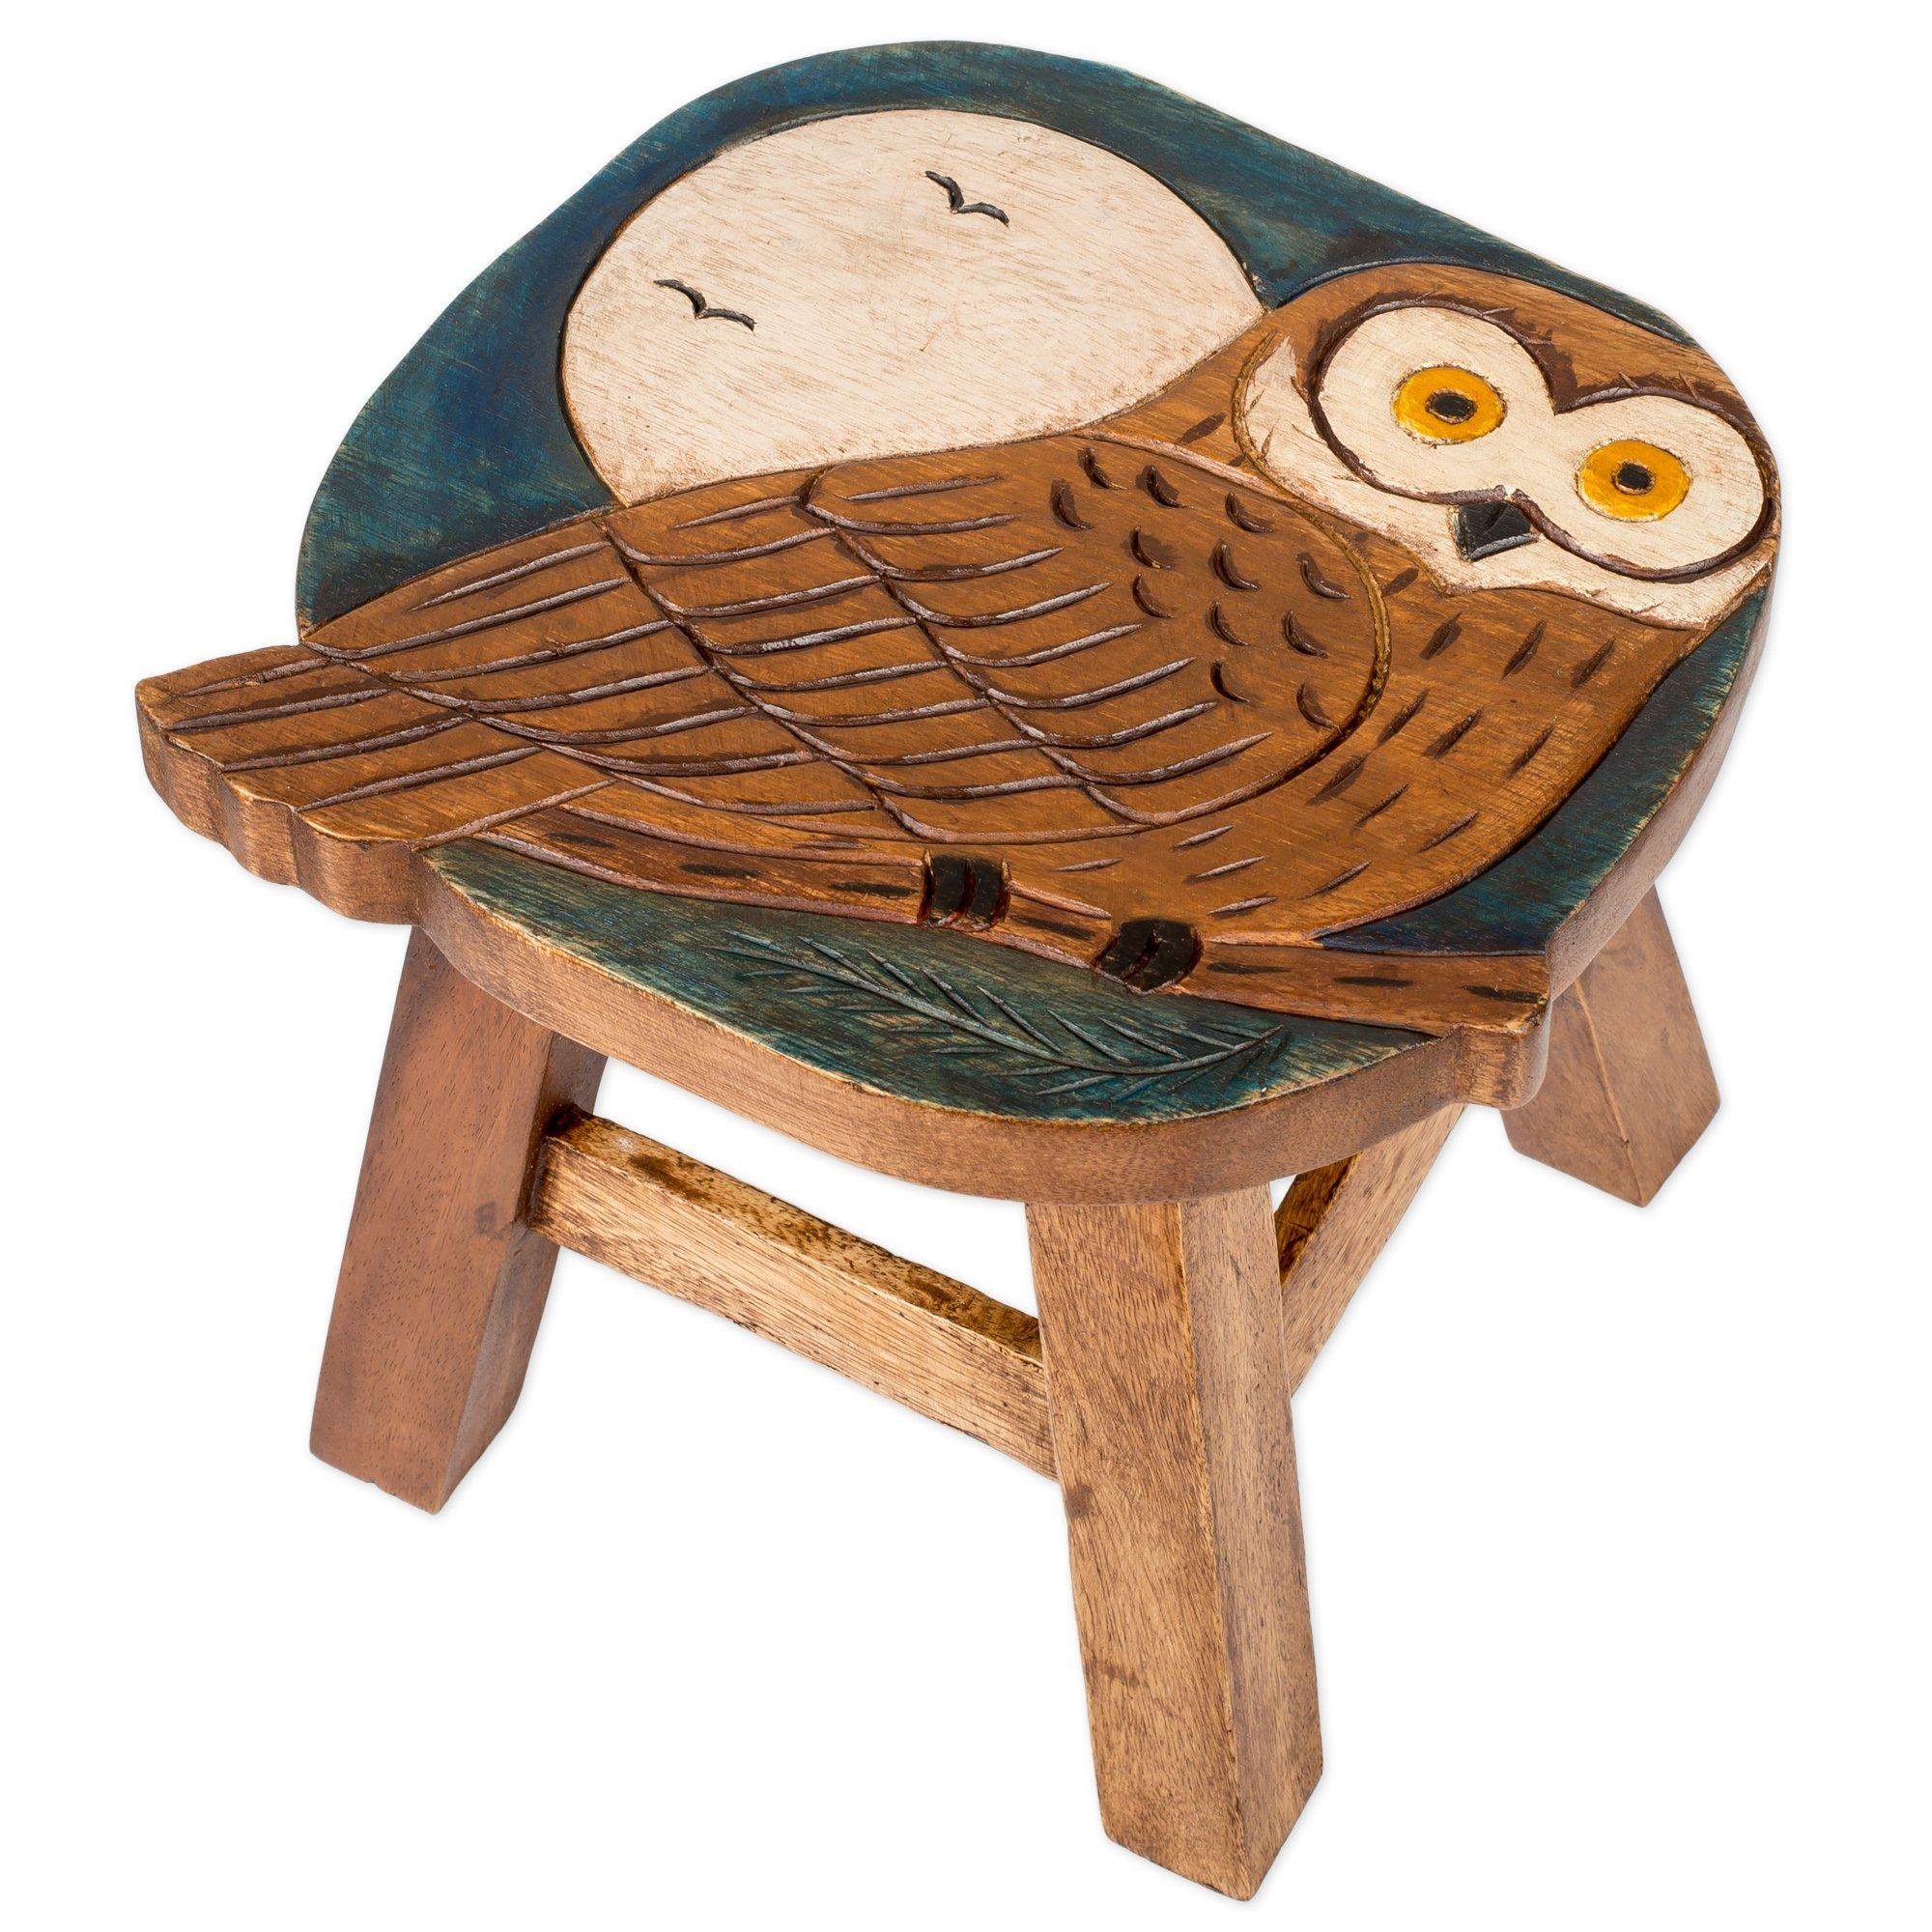 Owl Design Hand Carved Acacia Hardwood Decorative Short Stool